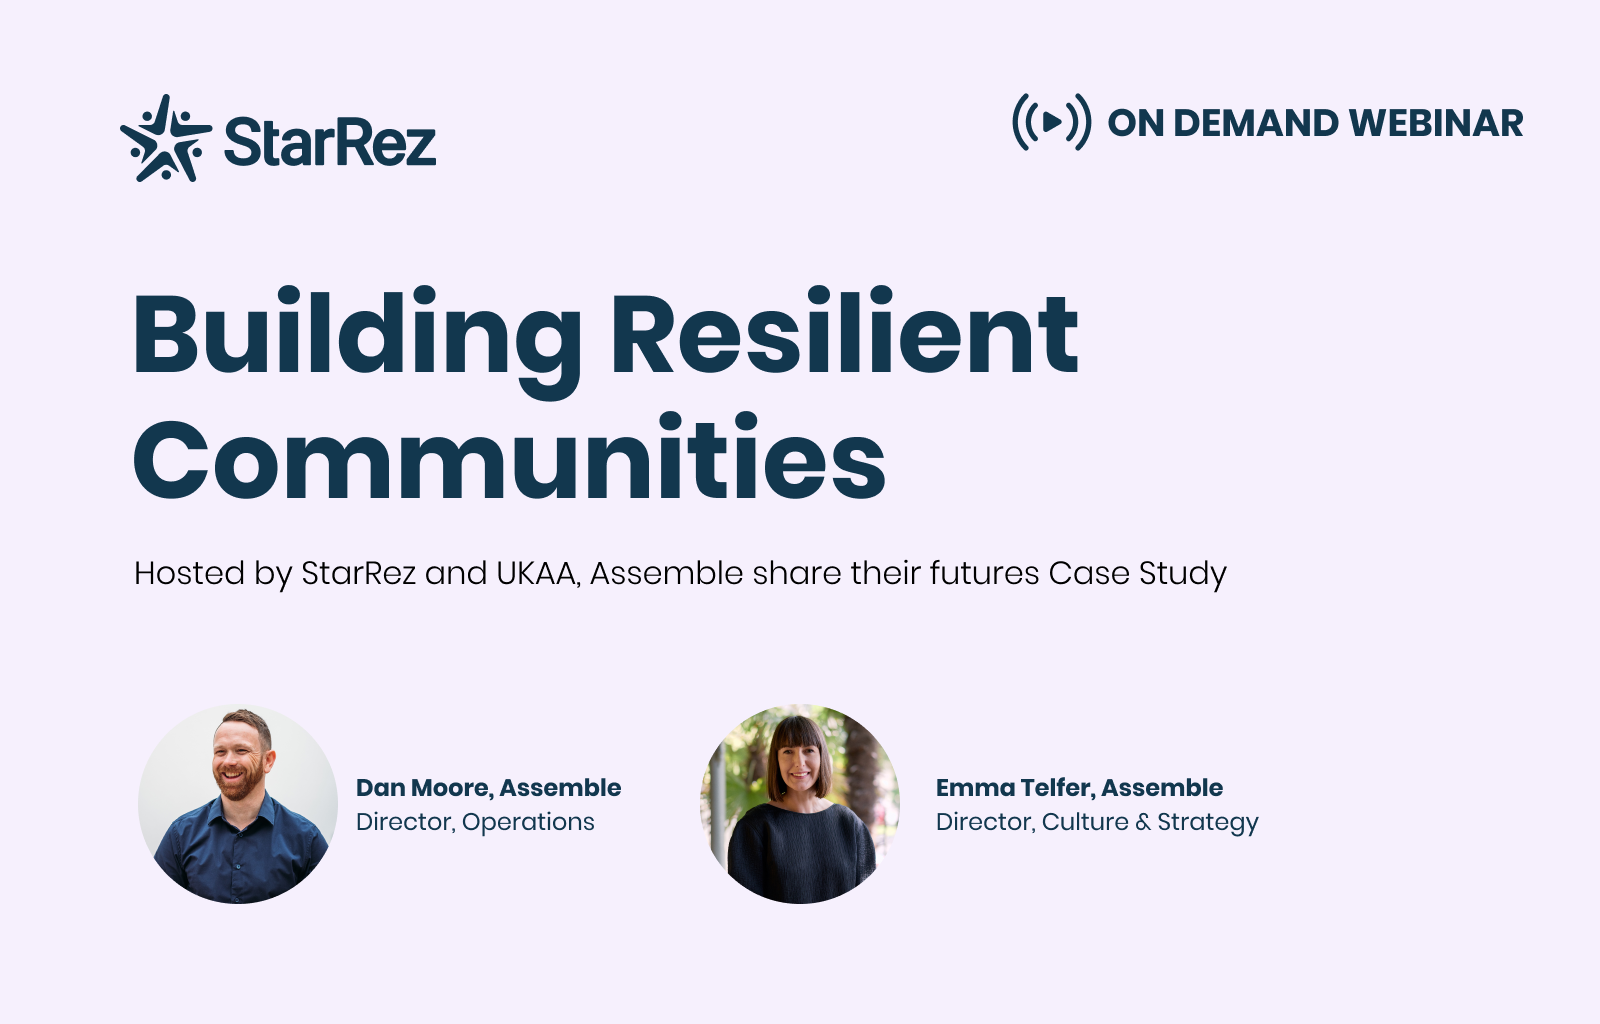 Assemble and UKAA webinar - Building Resilient Communities